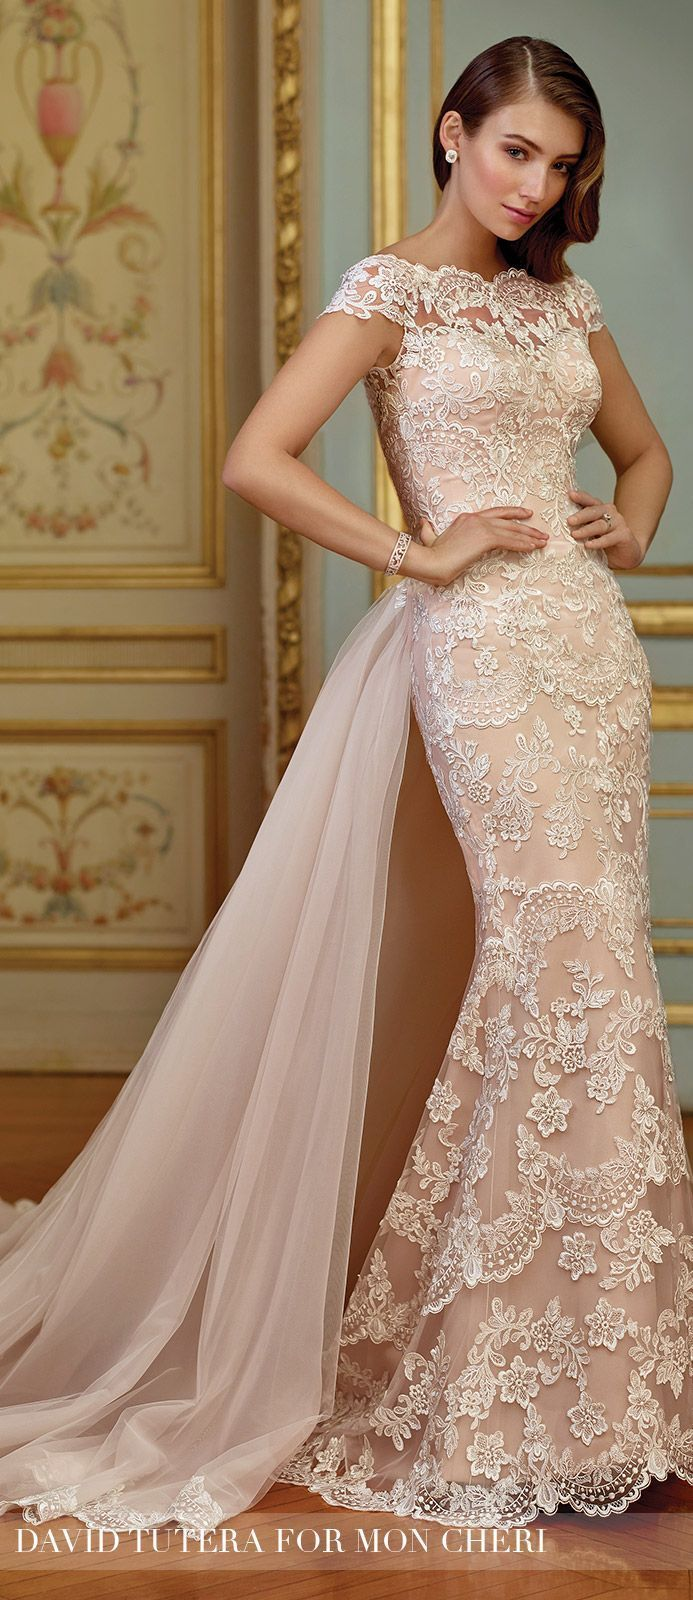 Nice wedding dresses  Nice Wedding Dresses Wedding dresses  Check more at